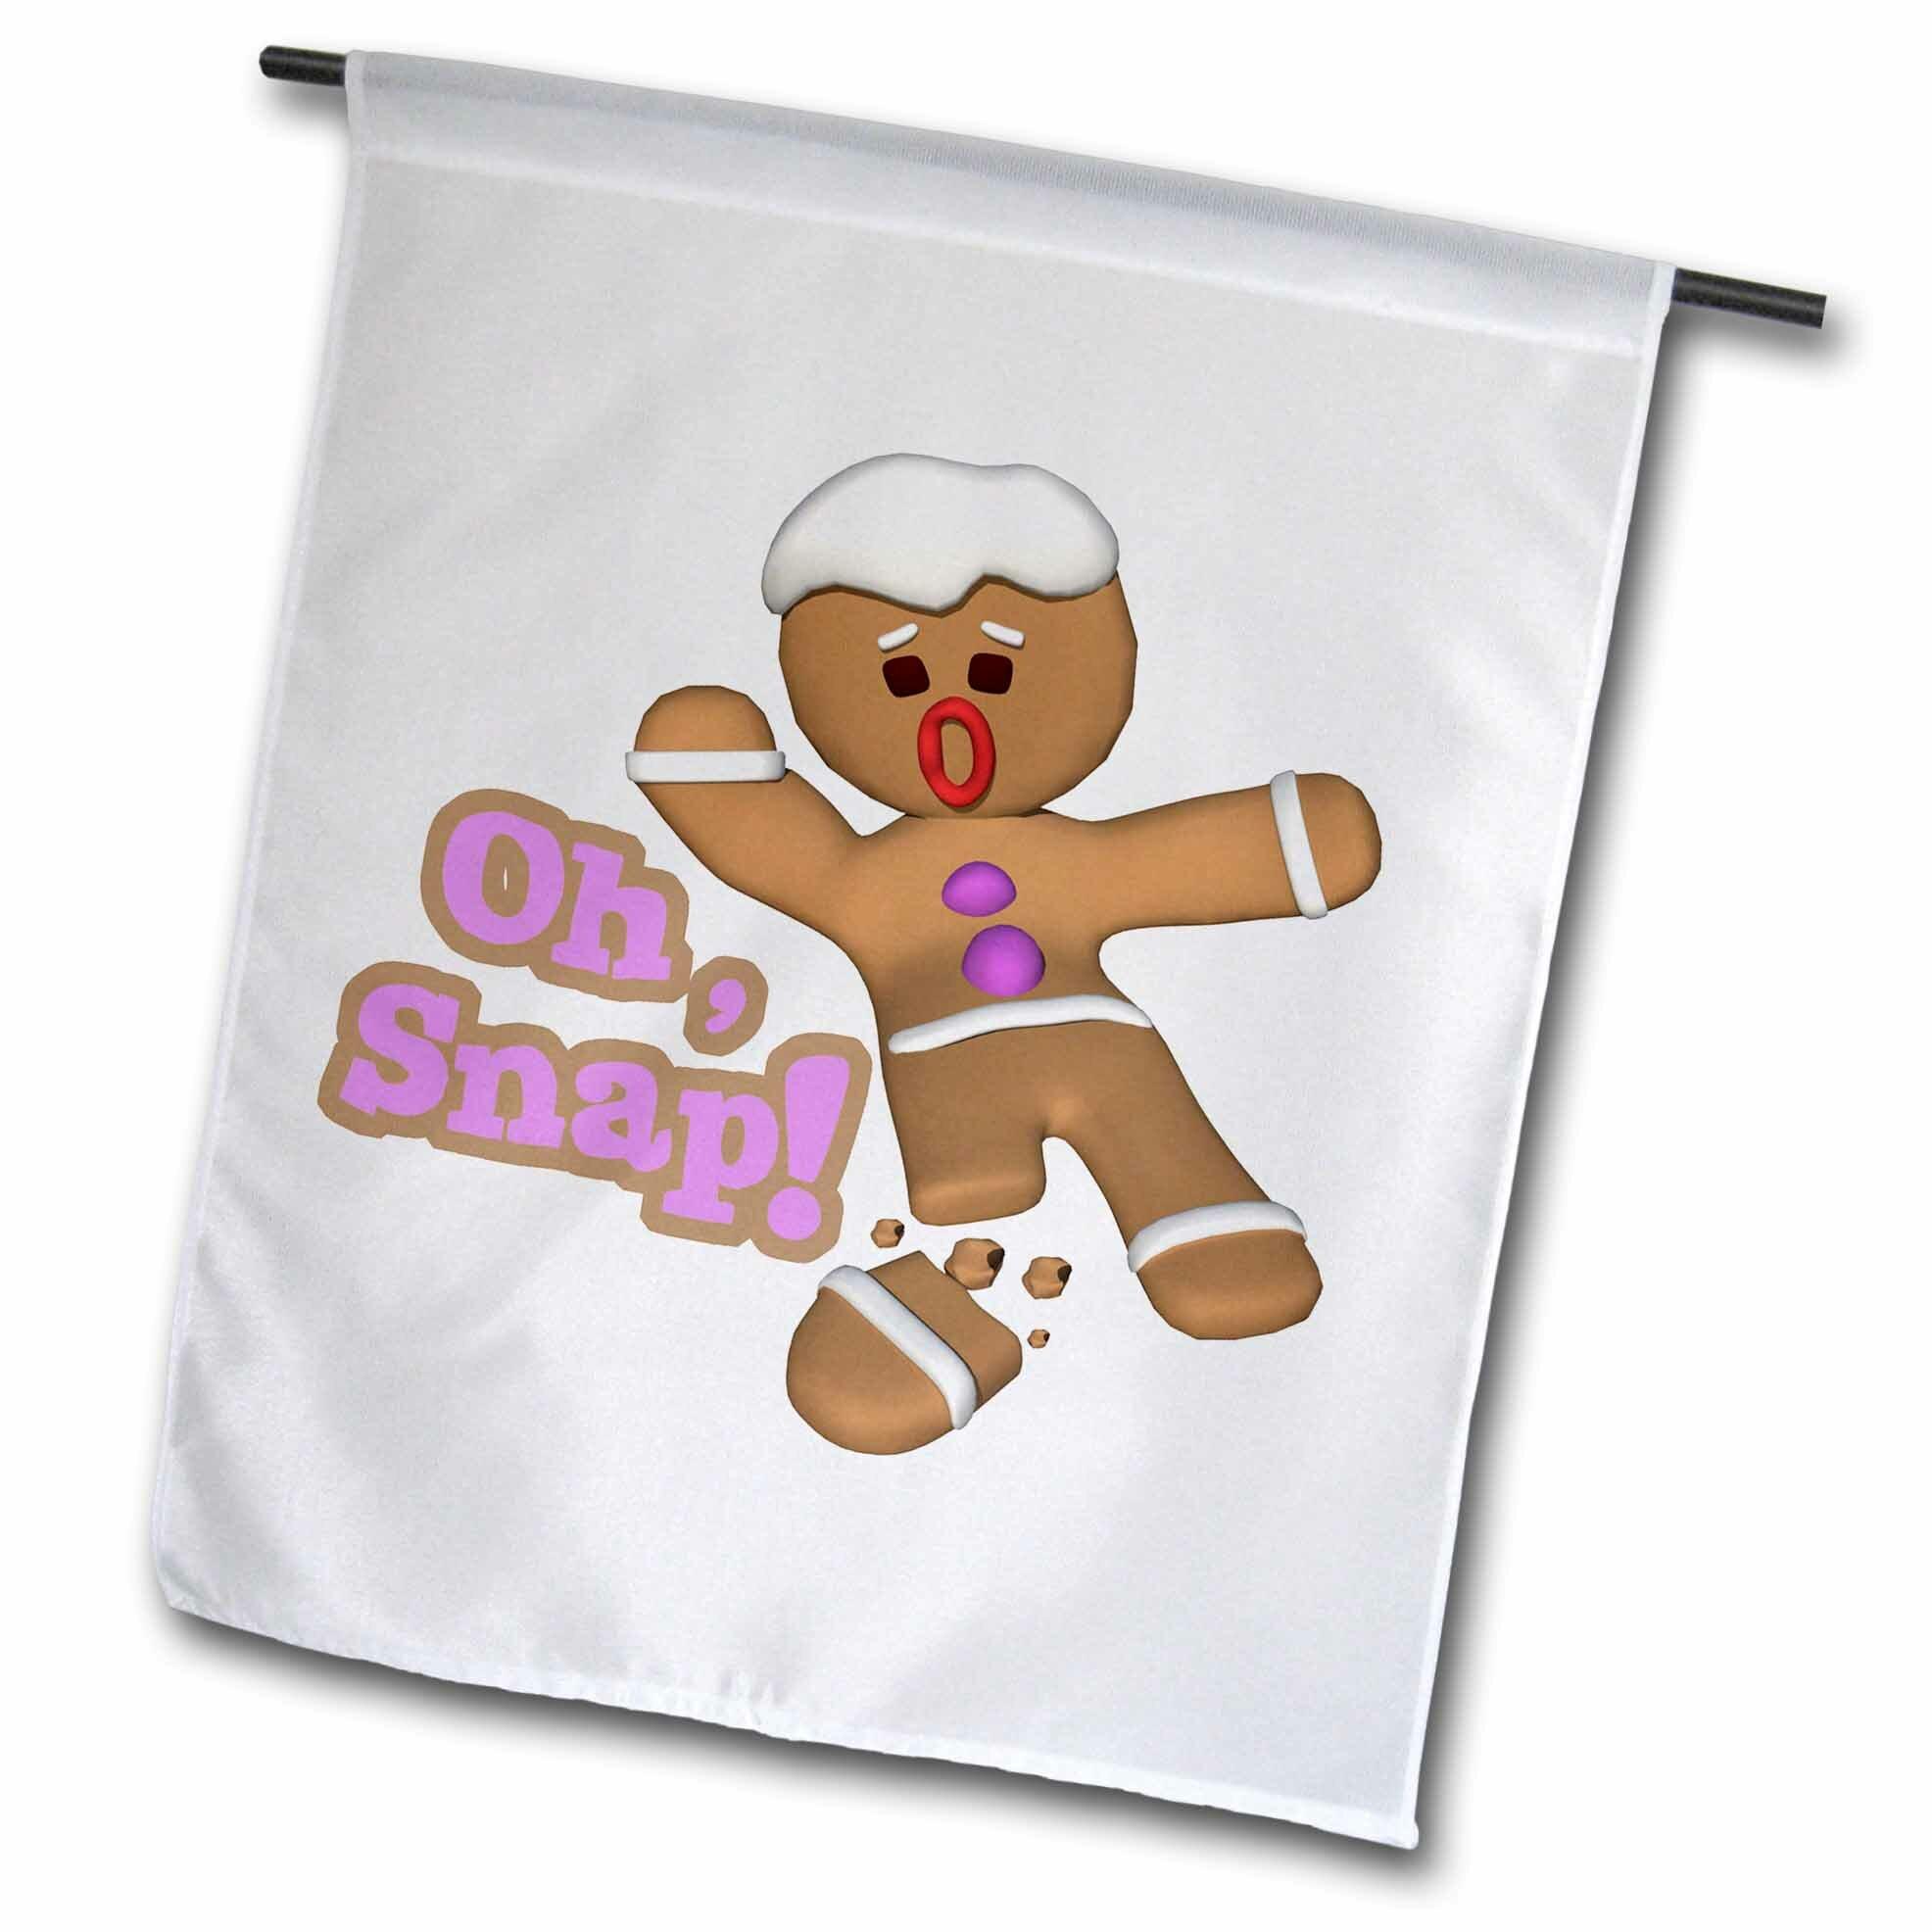 Oh Snap Broken Sned Gingerbread Man